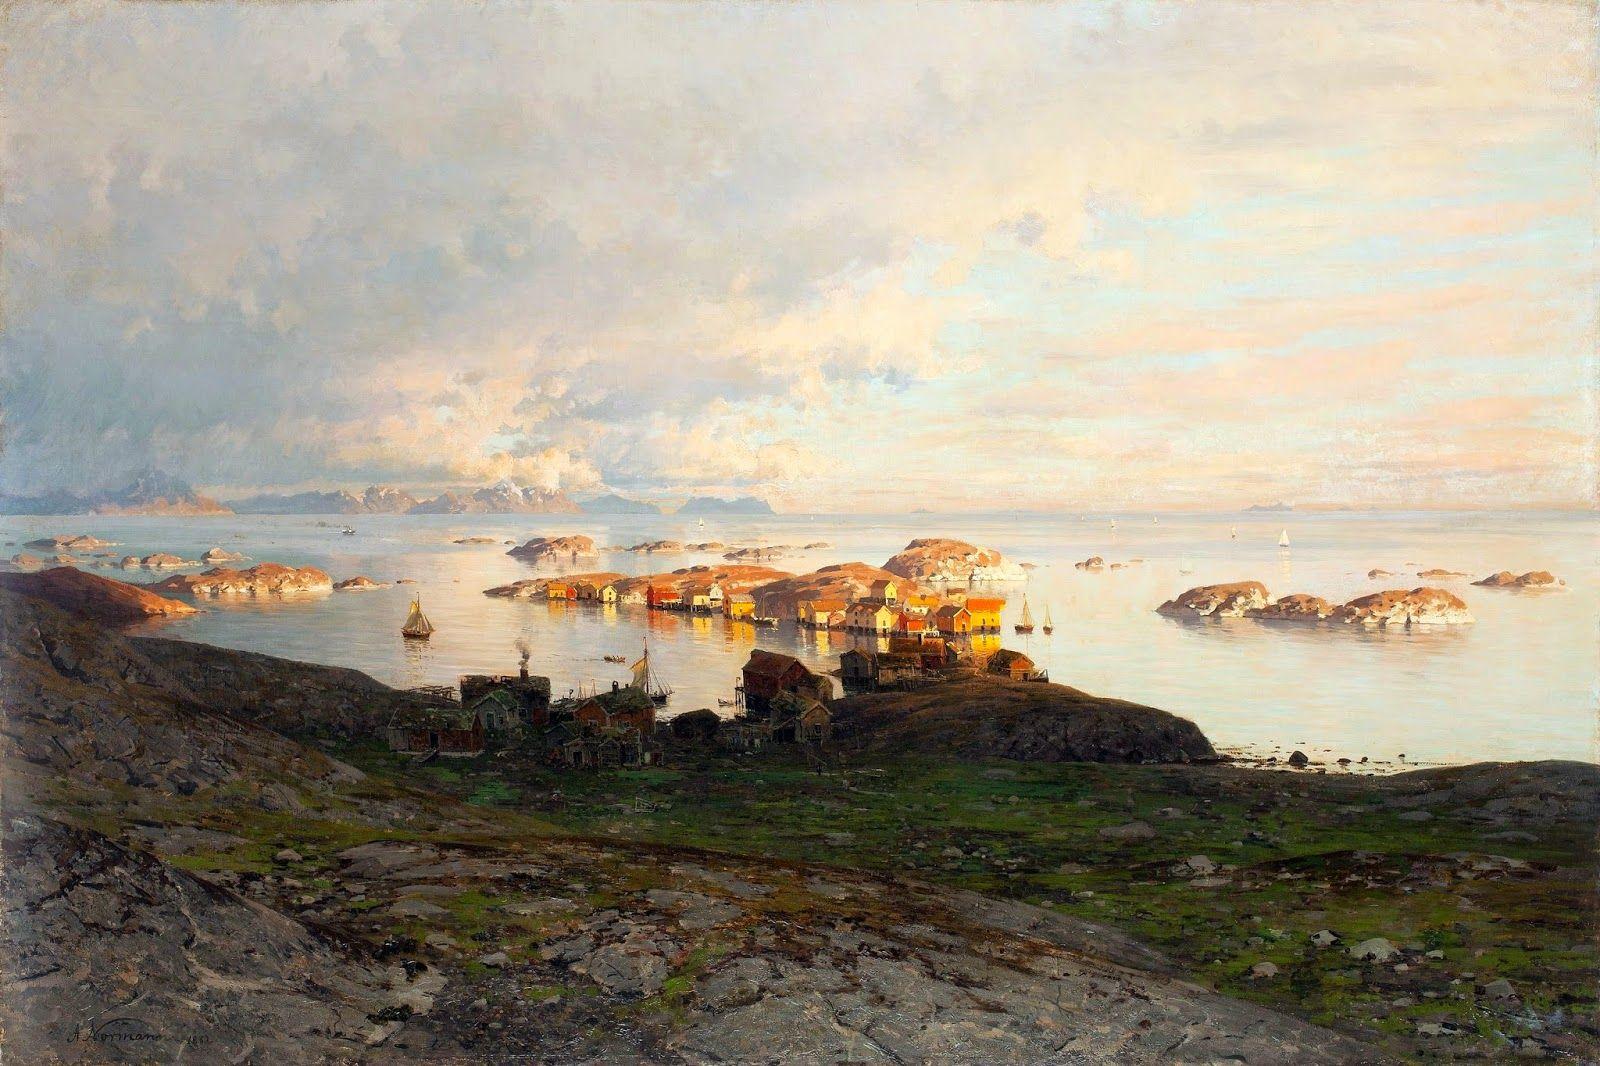 Adelsteen Normann - private collection. Sommernatt i Lofoten Summer night in Lofoten (1882)  #19th #AdelsteenNormann #Classic #Painting #Scene